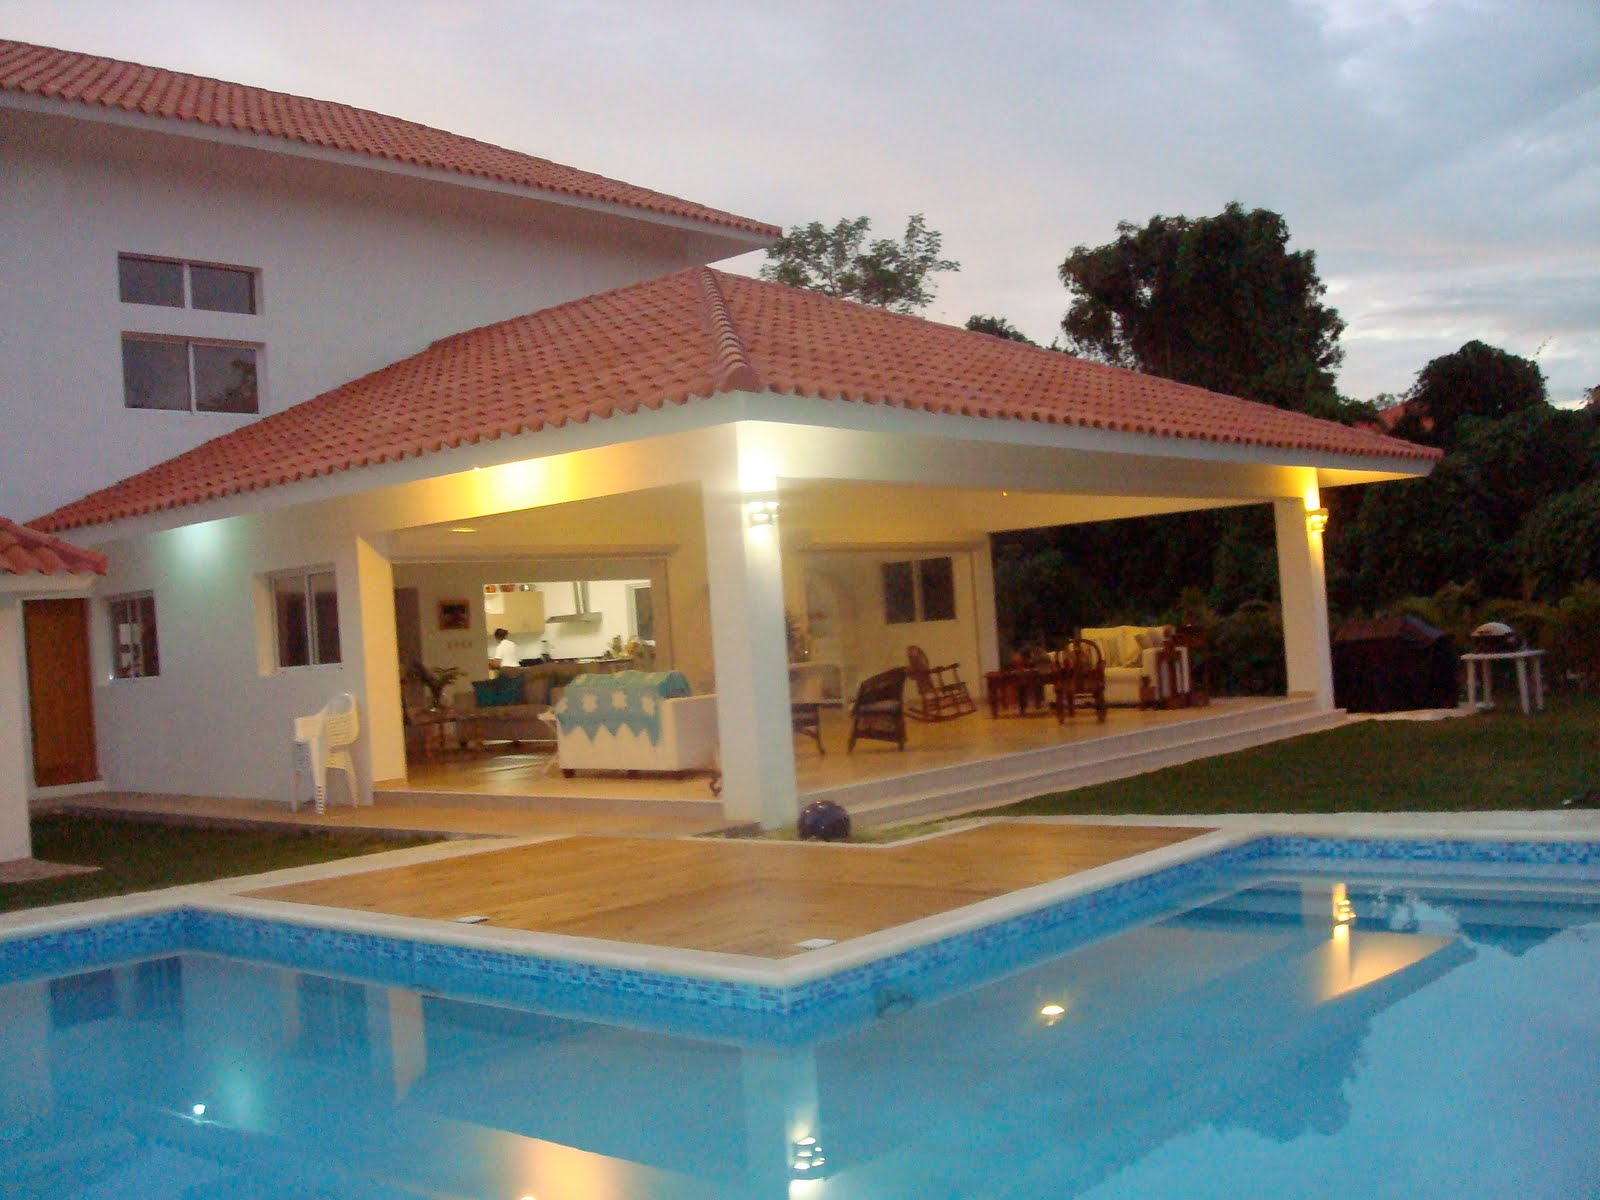 Juandoliando se vende la casa ideal - La casa ideal ...